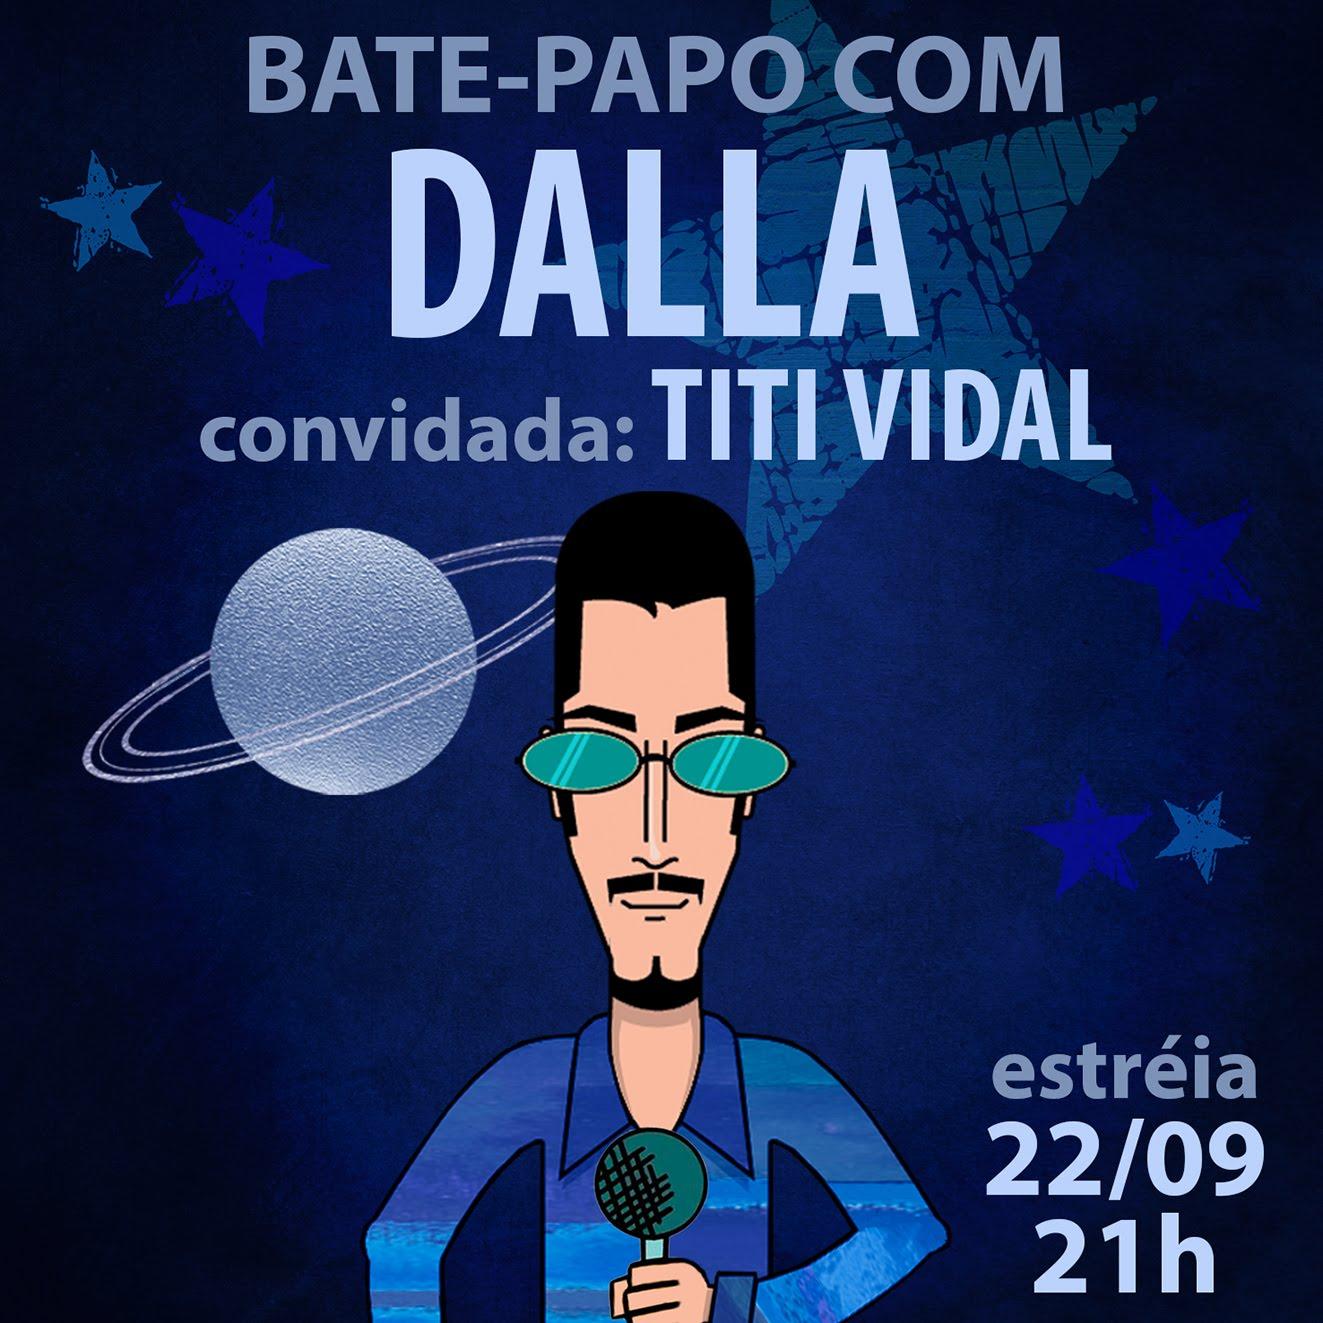 ESTREÍA 22/09 - BATE-PAPO COM DALLA